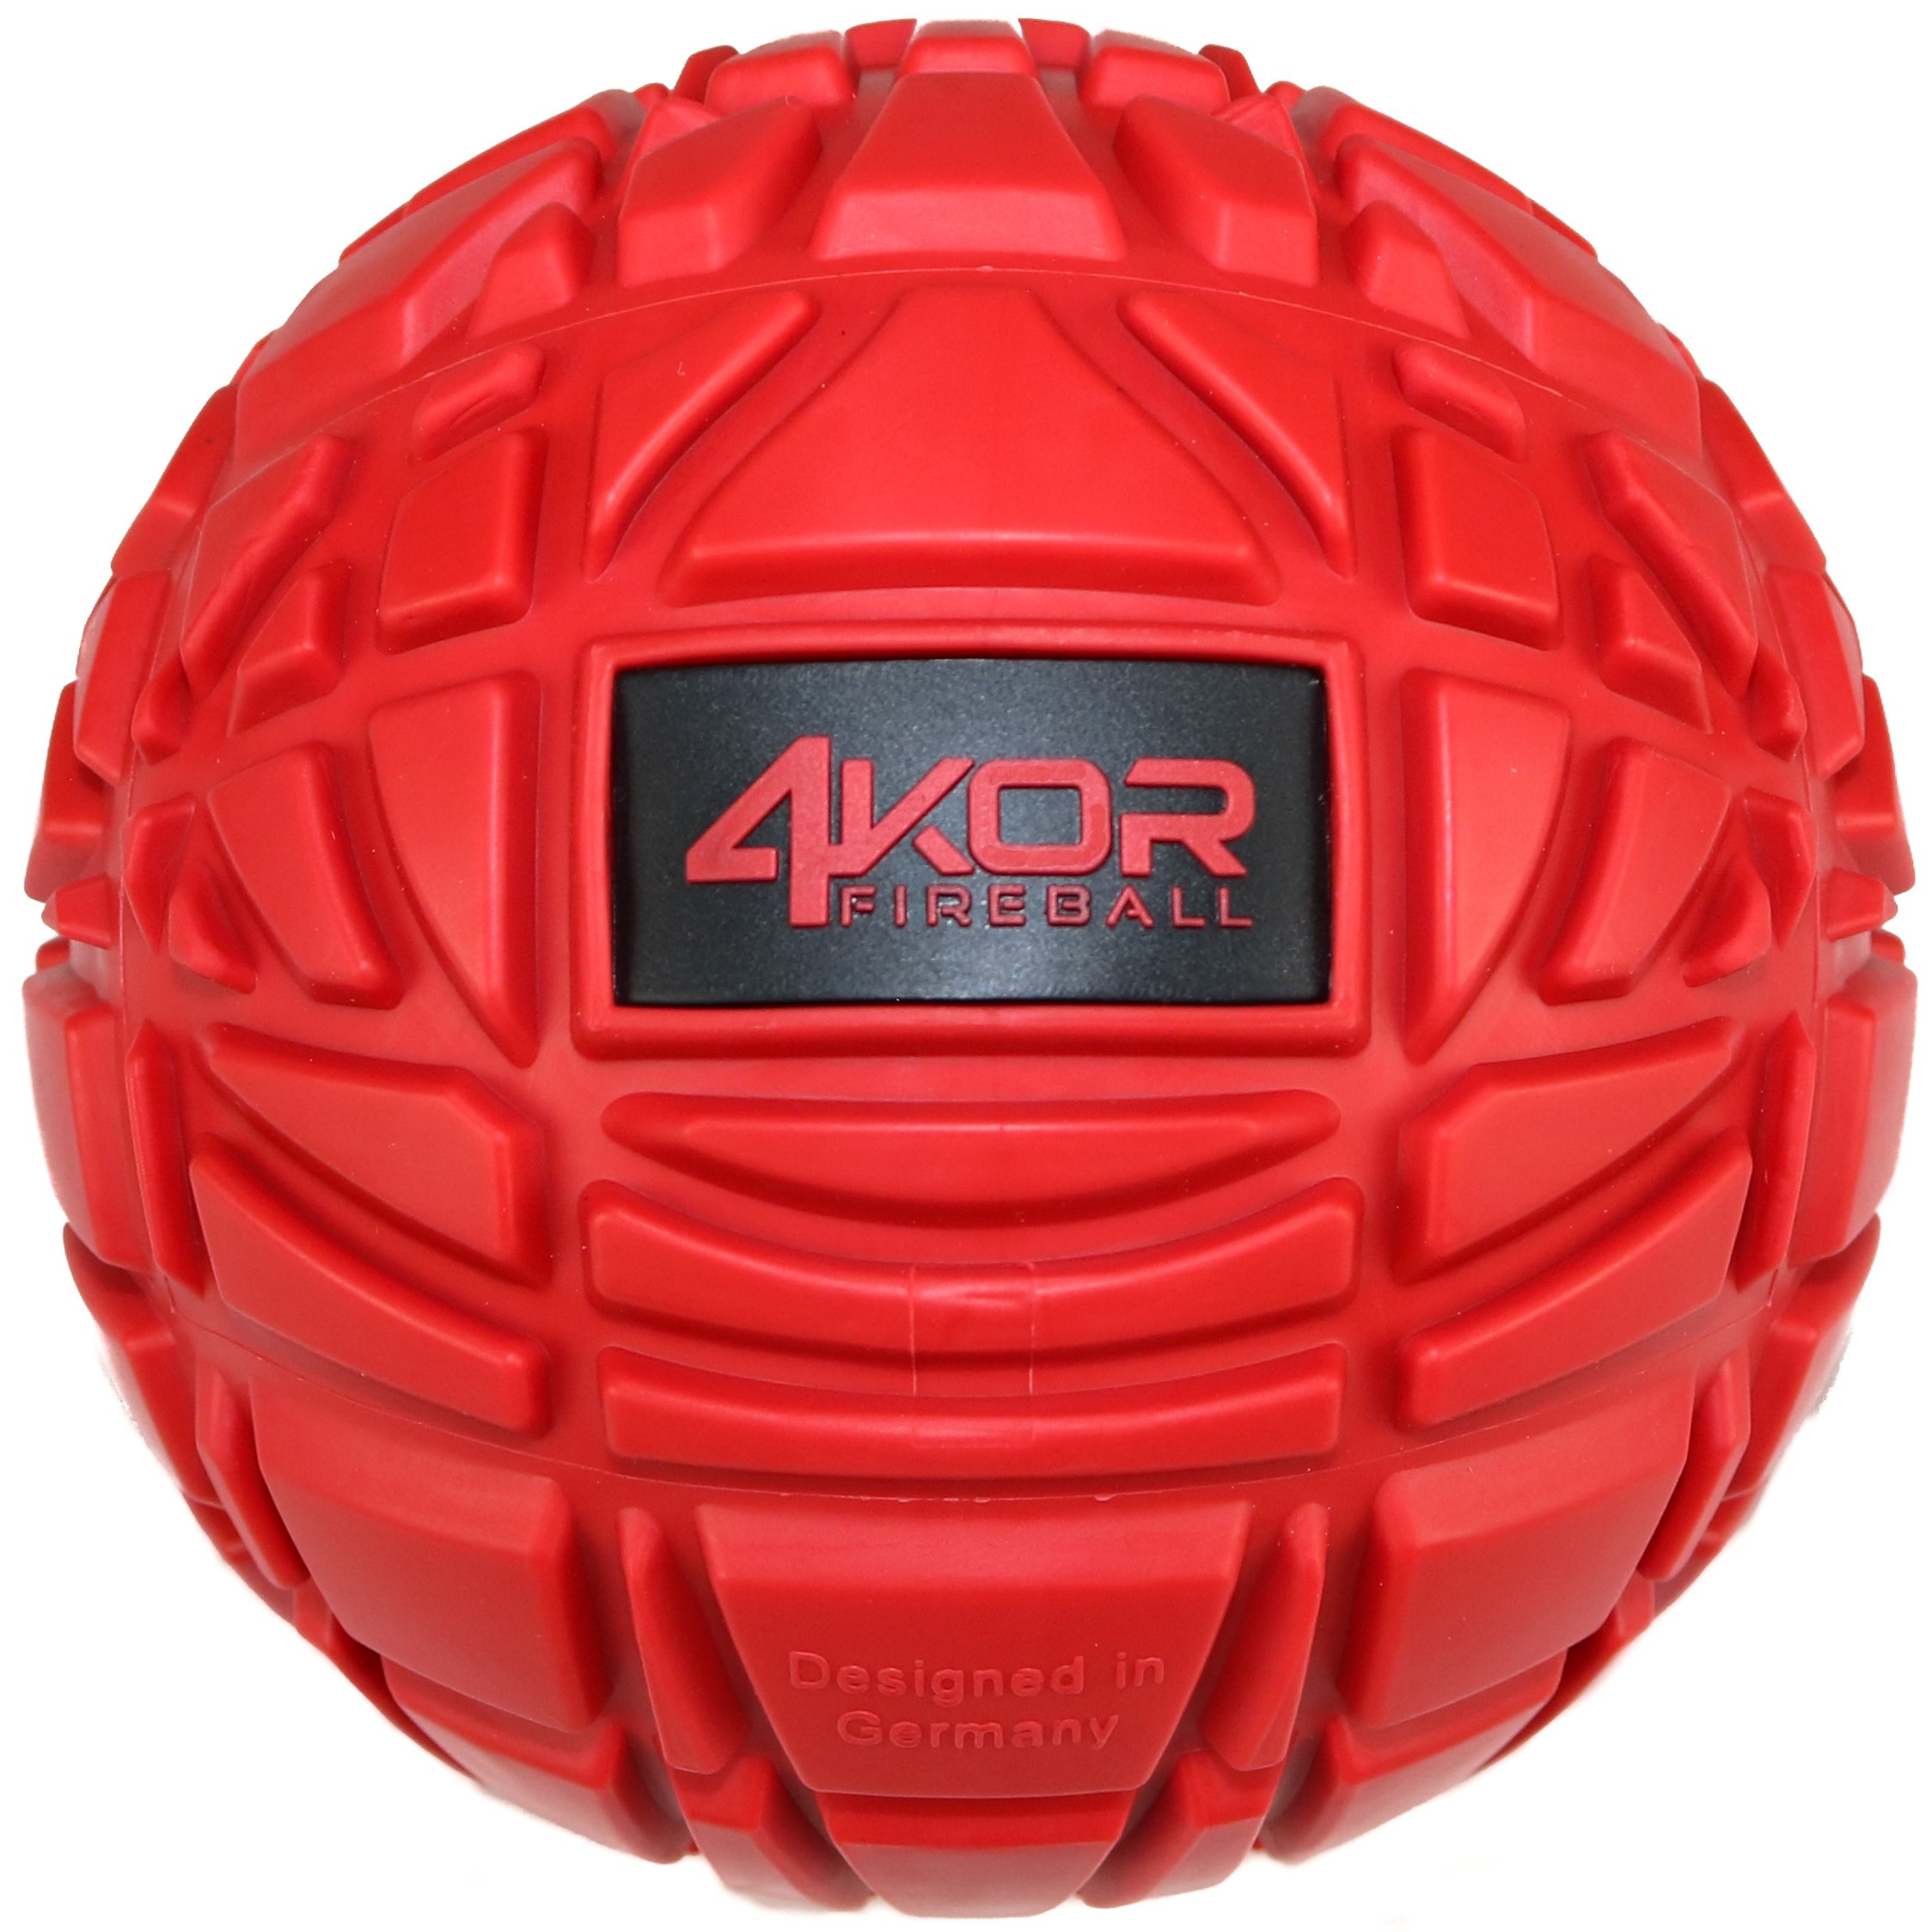 4.75'' 4KOR Fireball Deep Tissue Recovery Ball by 4KOR Fitness